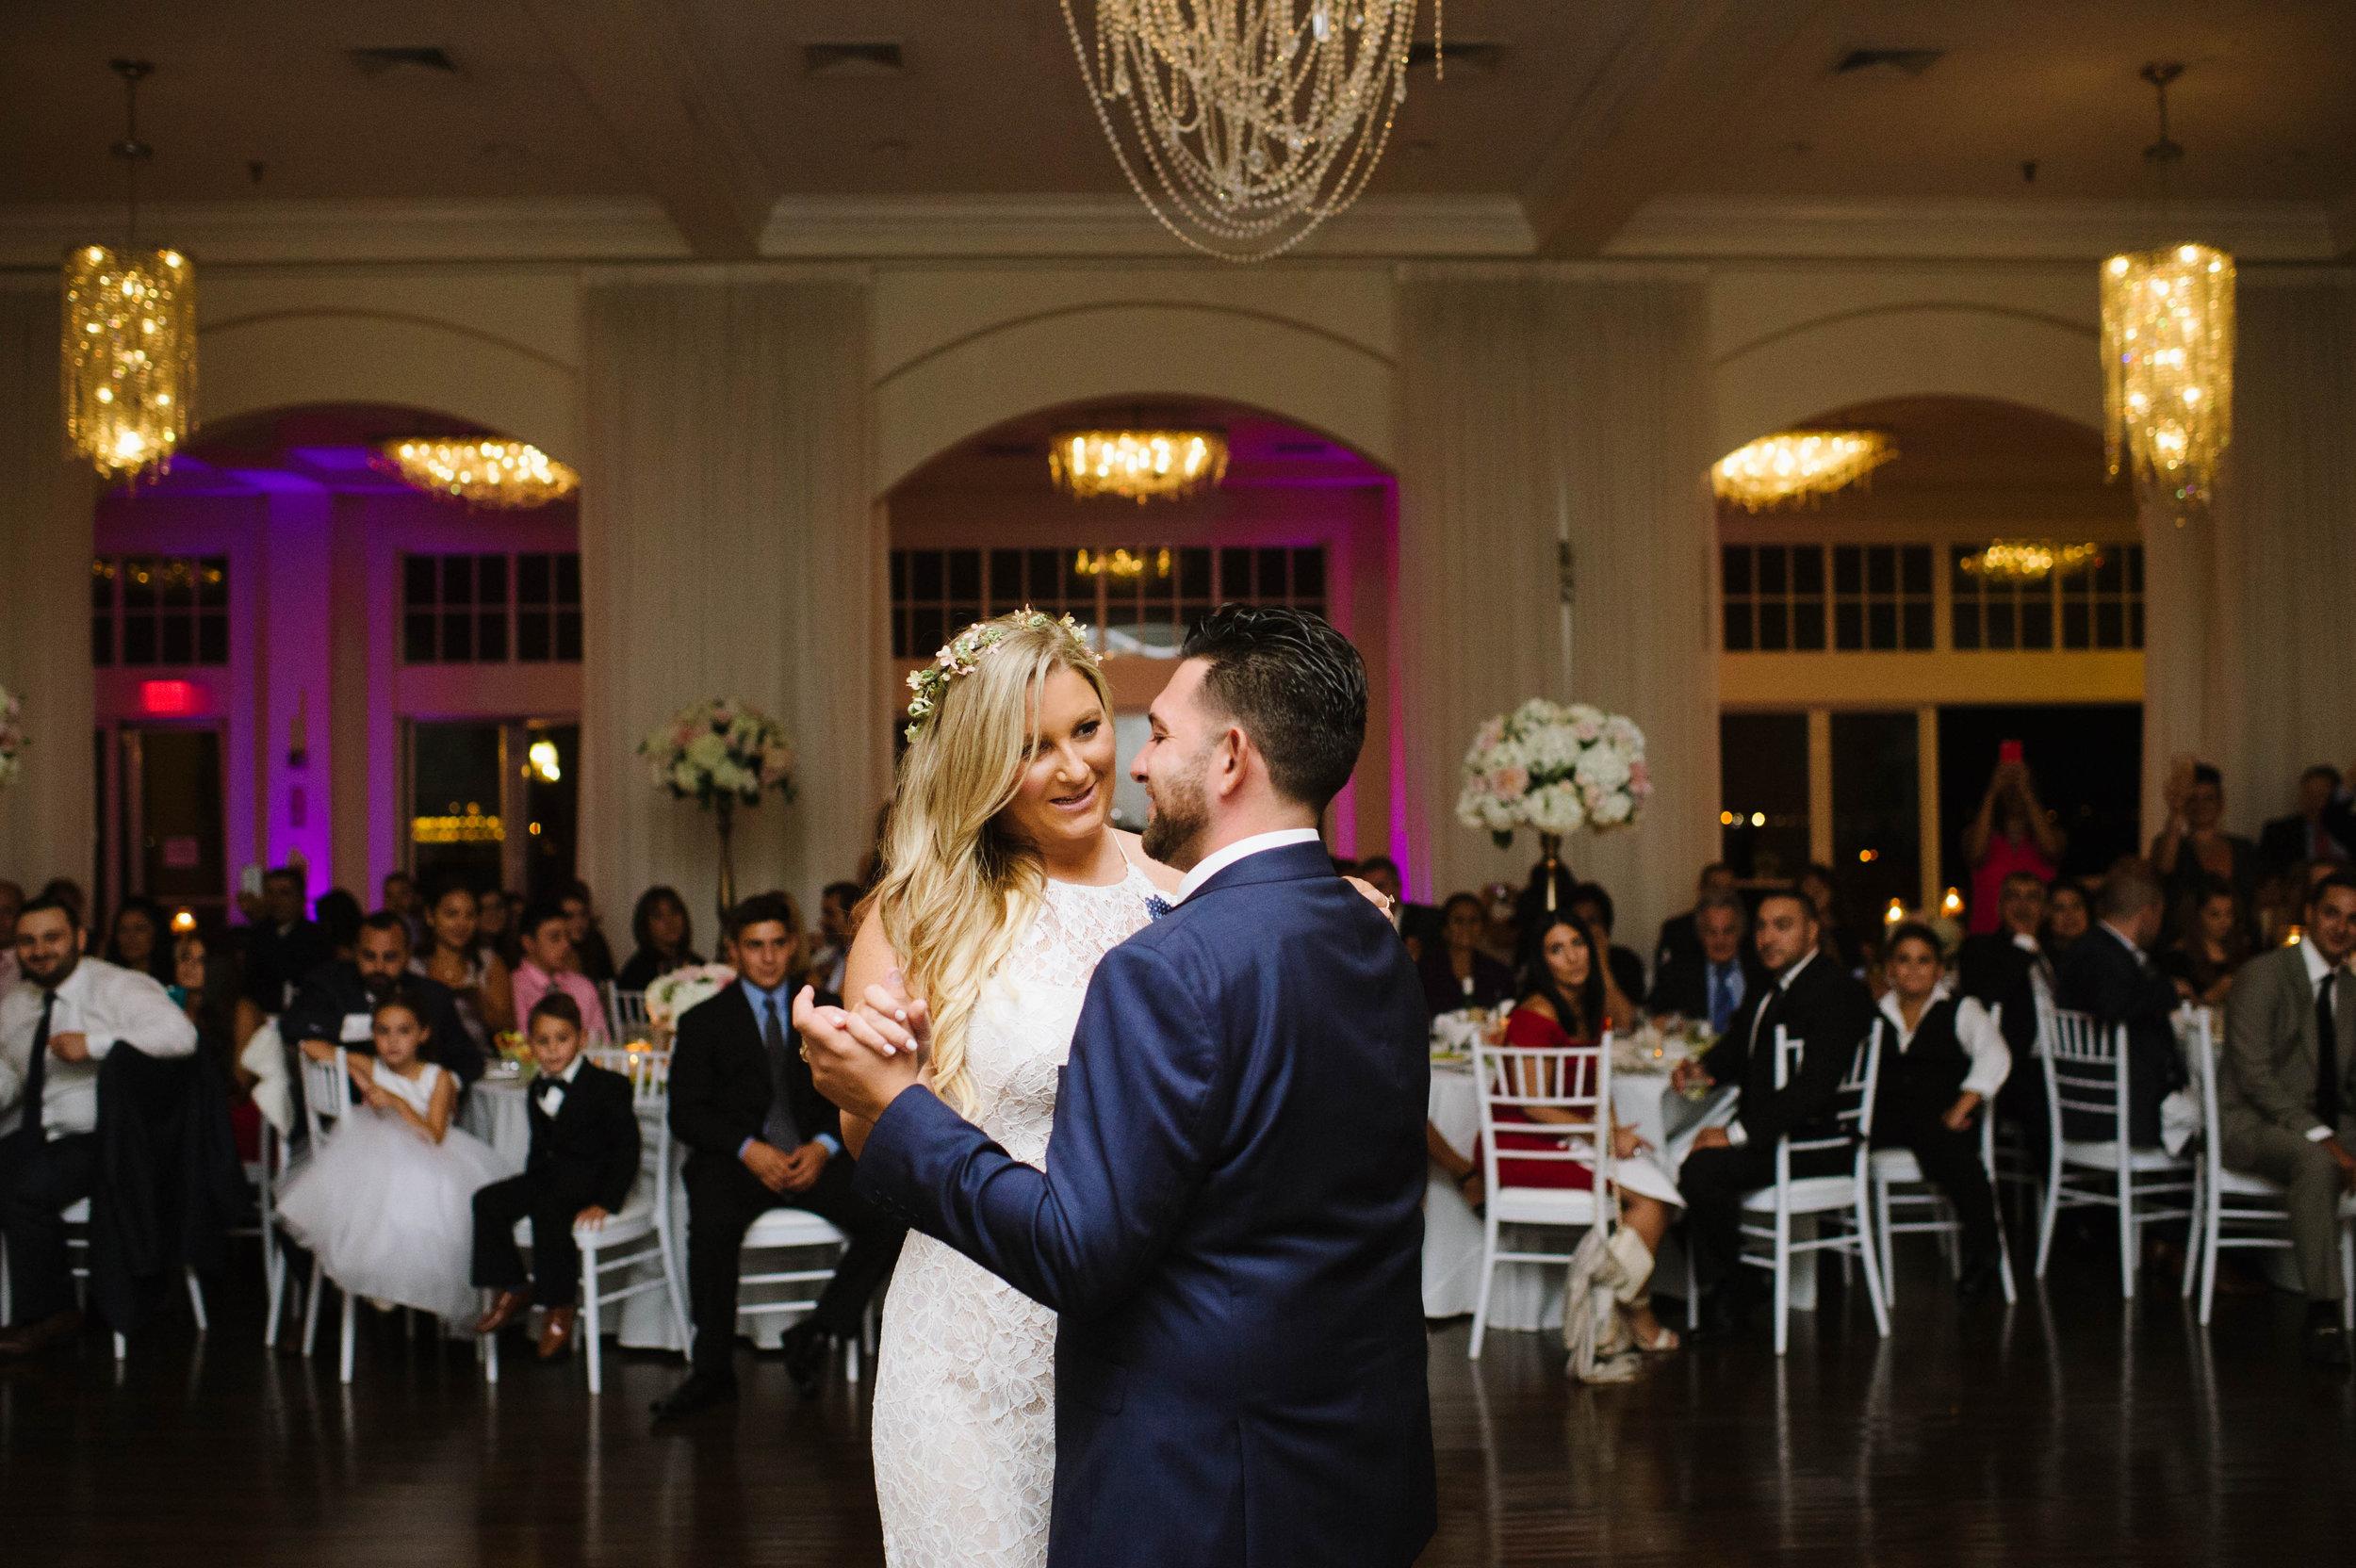 Documentary-Wedding-Photography-Newport007.jpg